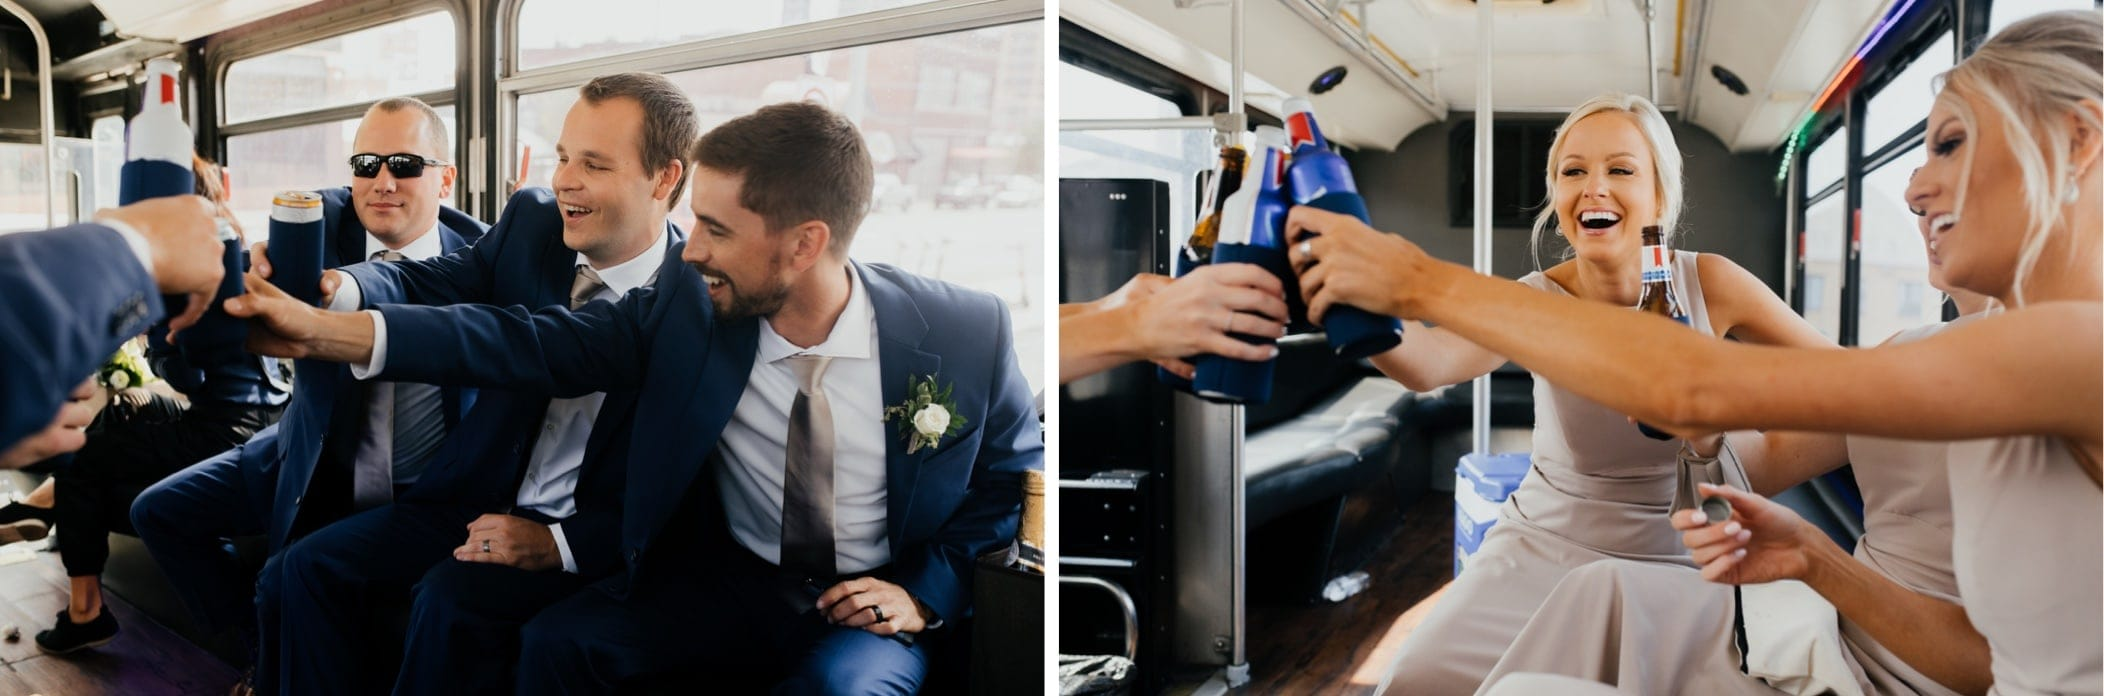 wedding party on party bus kansas city